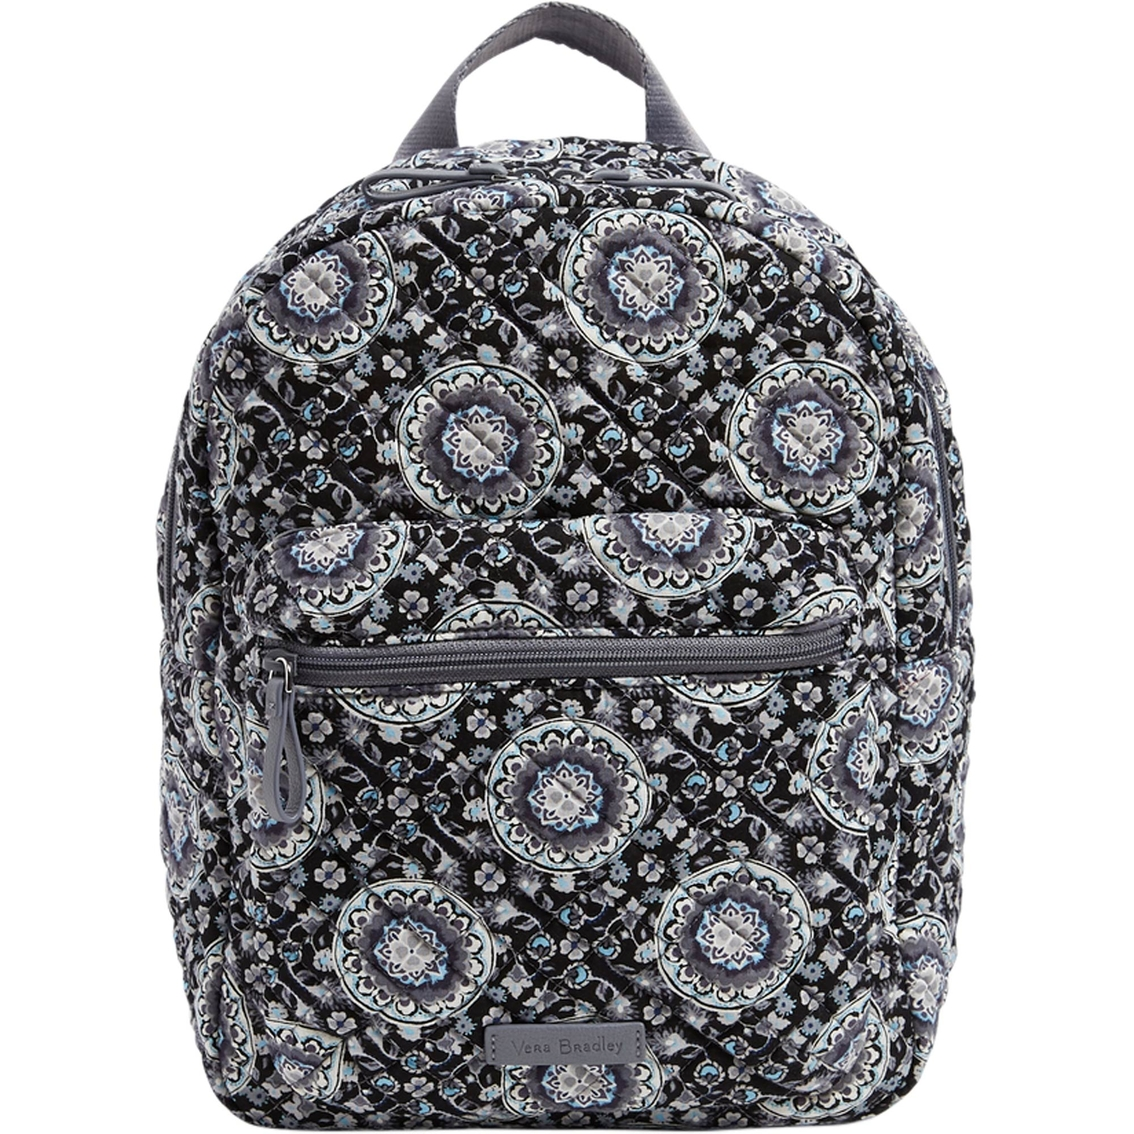 ef712fb24 Vera Bradley Iconic Leighton Backpack Charcoal Medallion | Backpacks ...